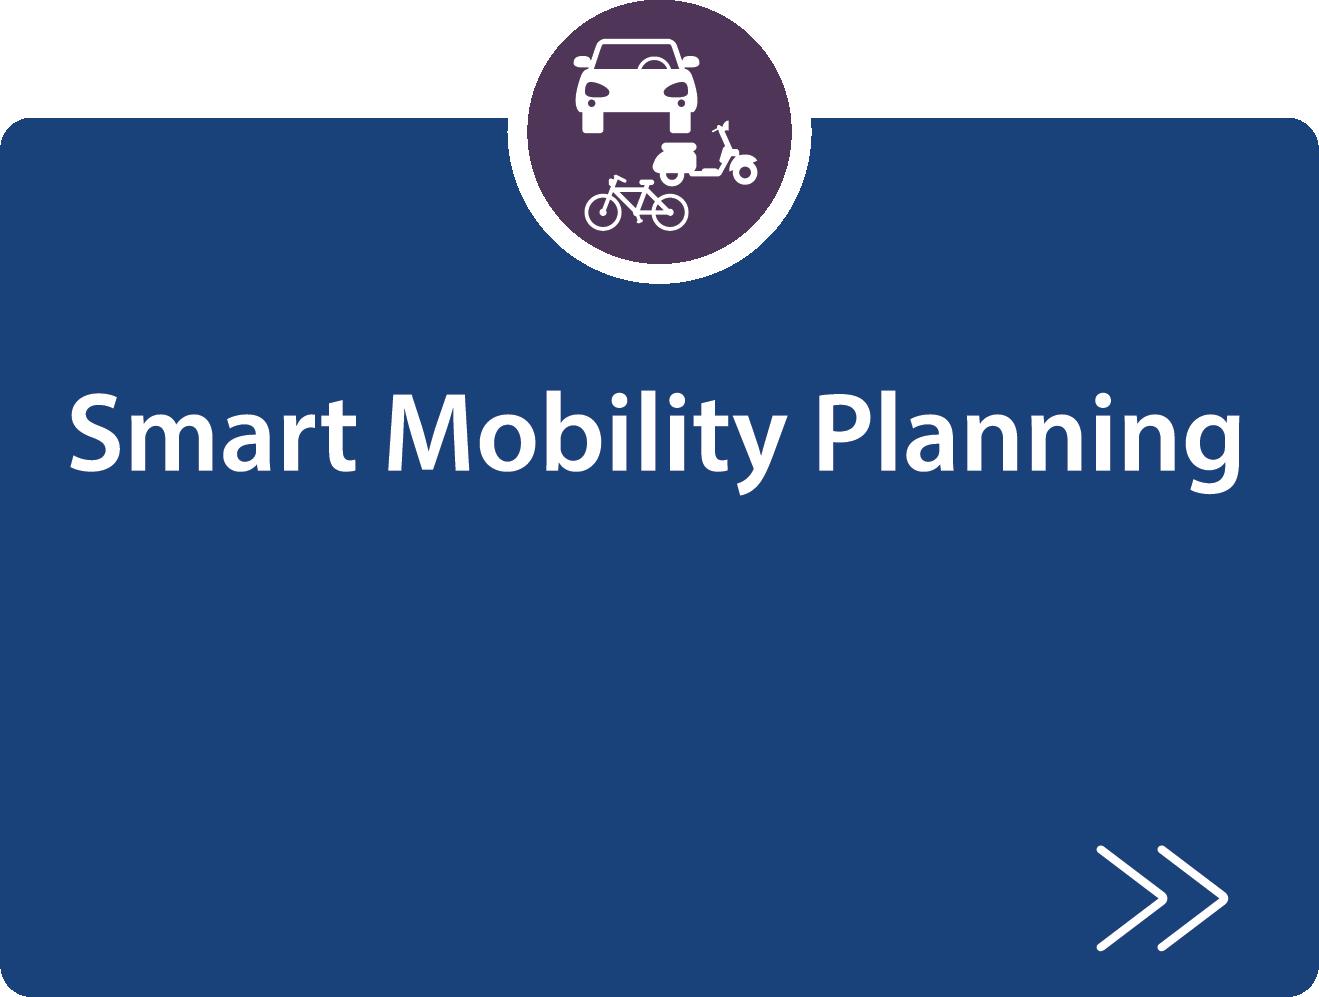 Smart Mobility Planning strategy description